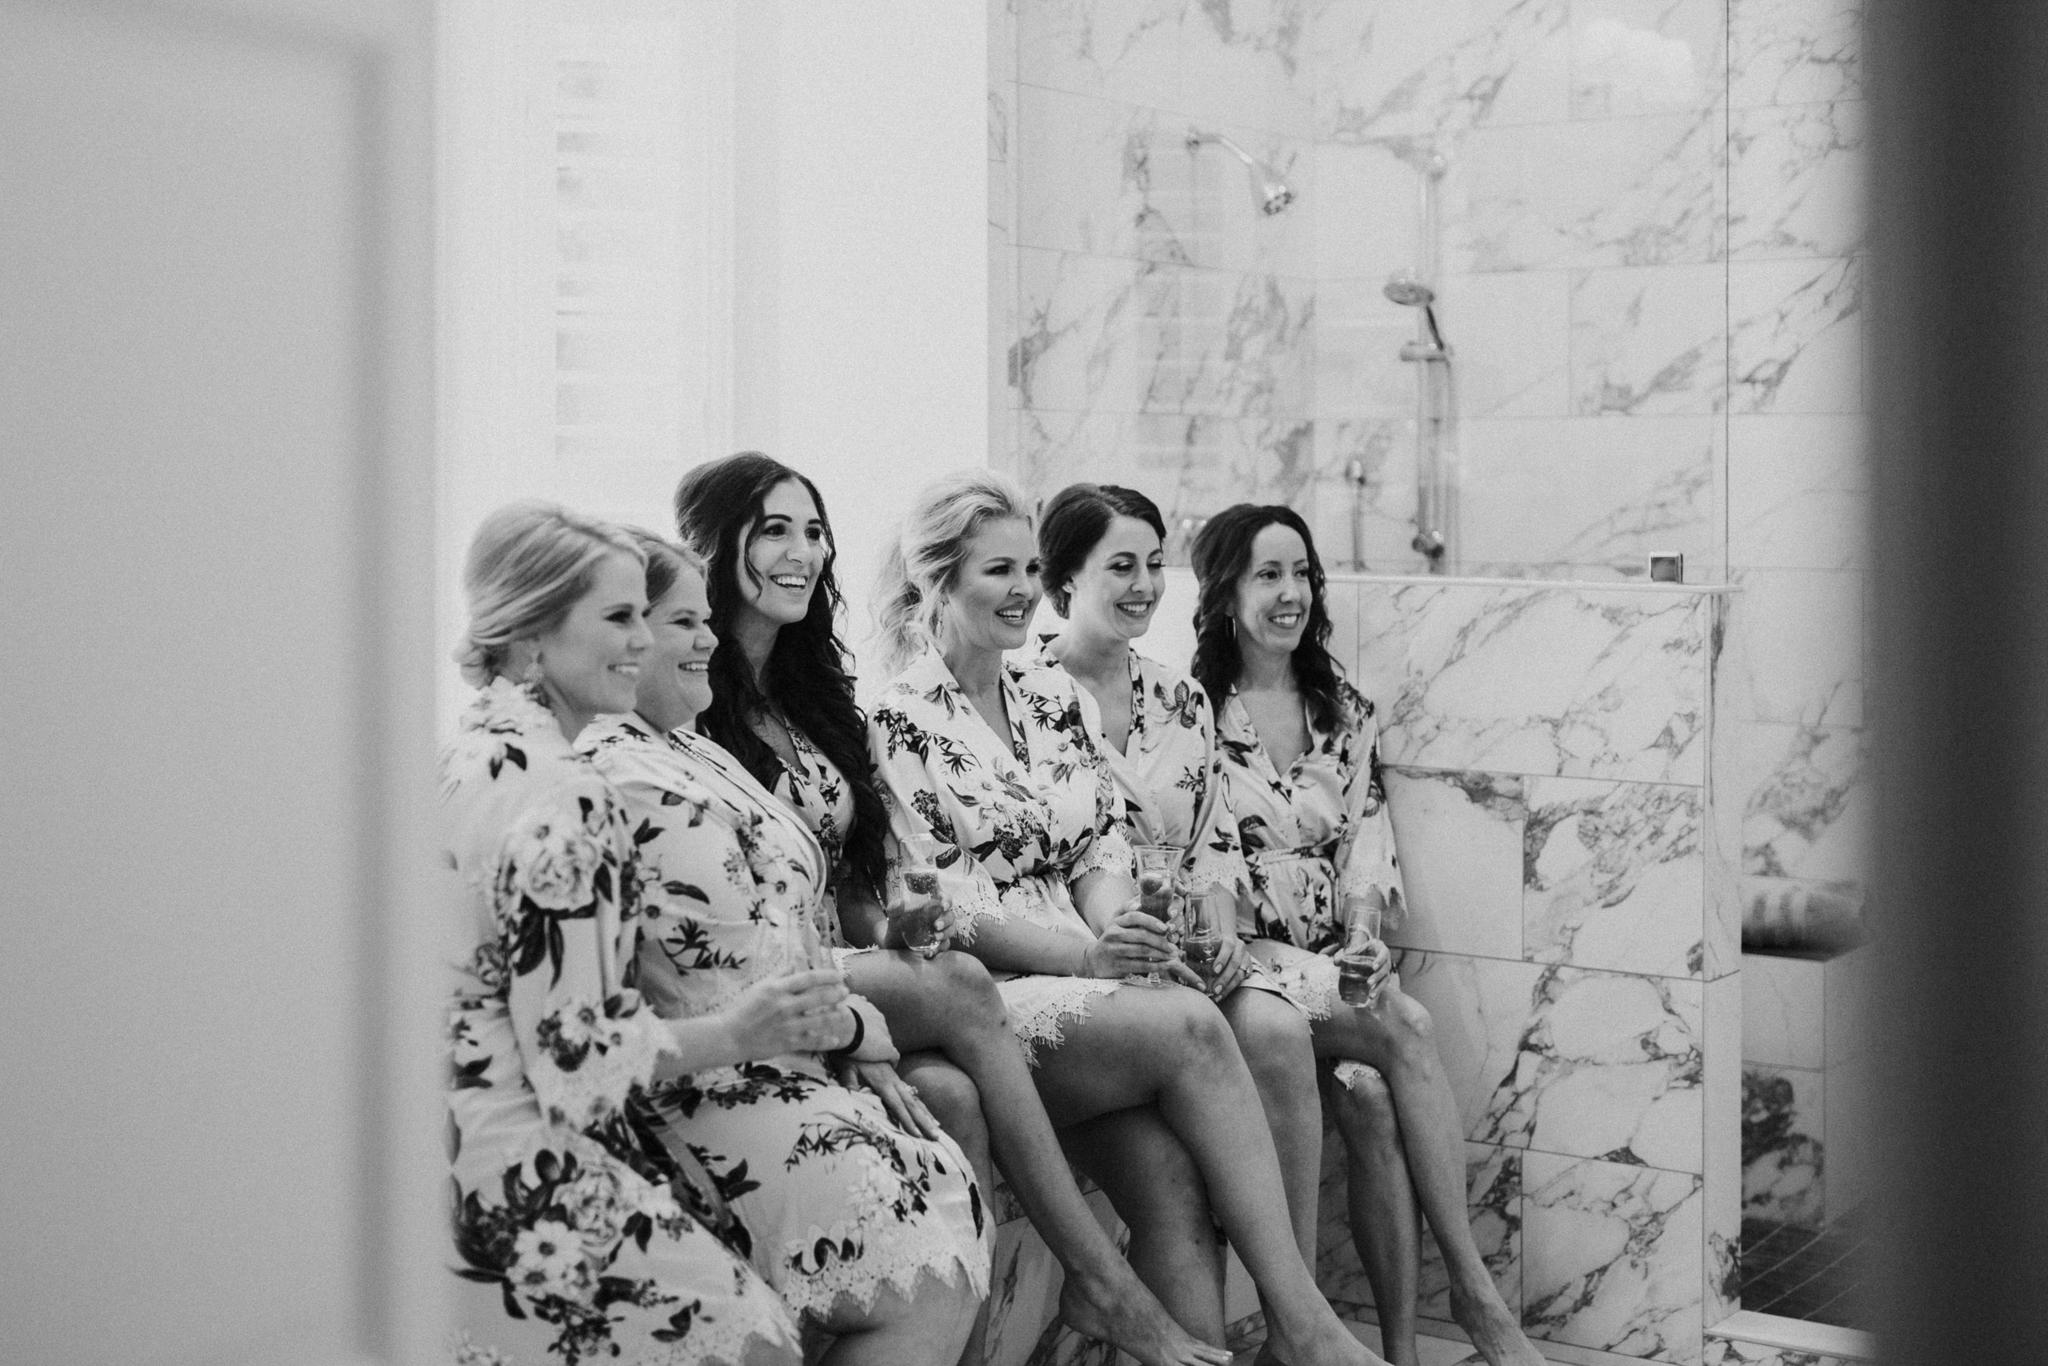 Houston Wedding Photographer-Intimate Texas Backyard Wedding- Houston Wedding Photographer -Kristen Giles Photography-6.jpg